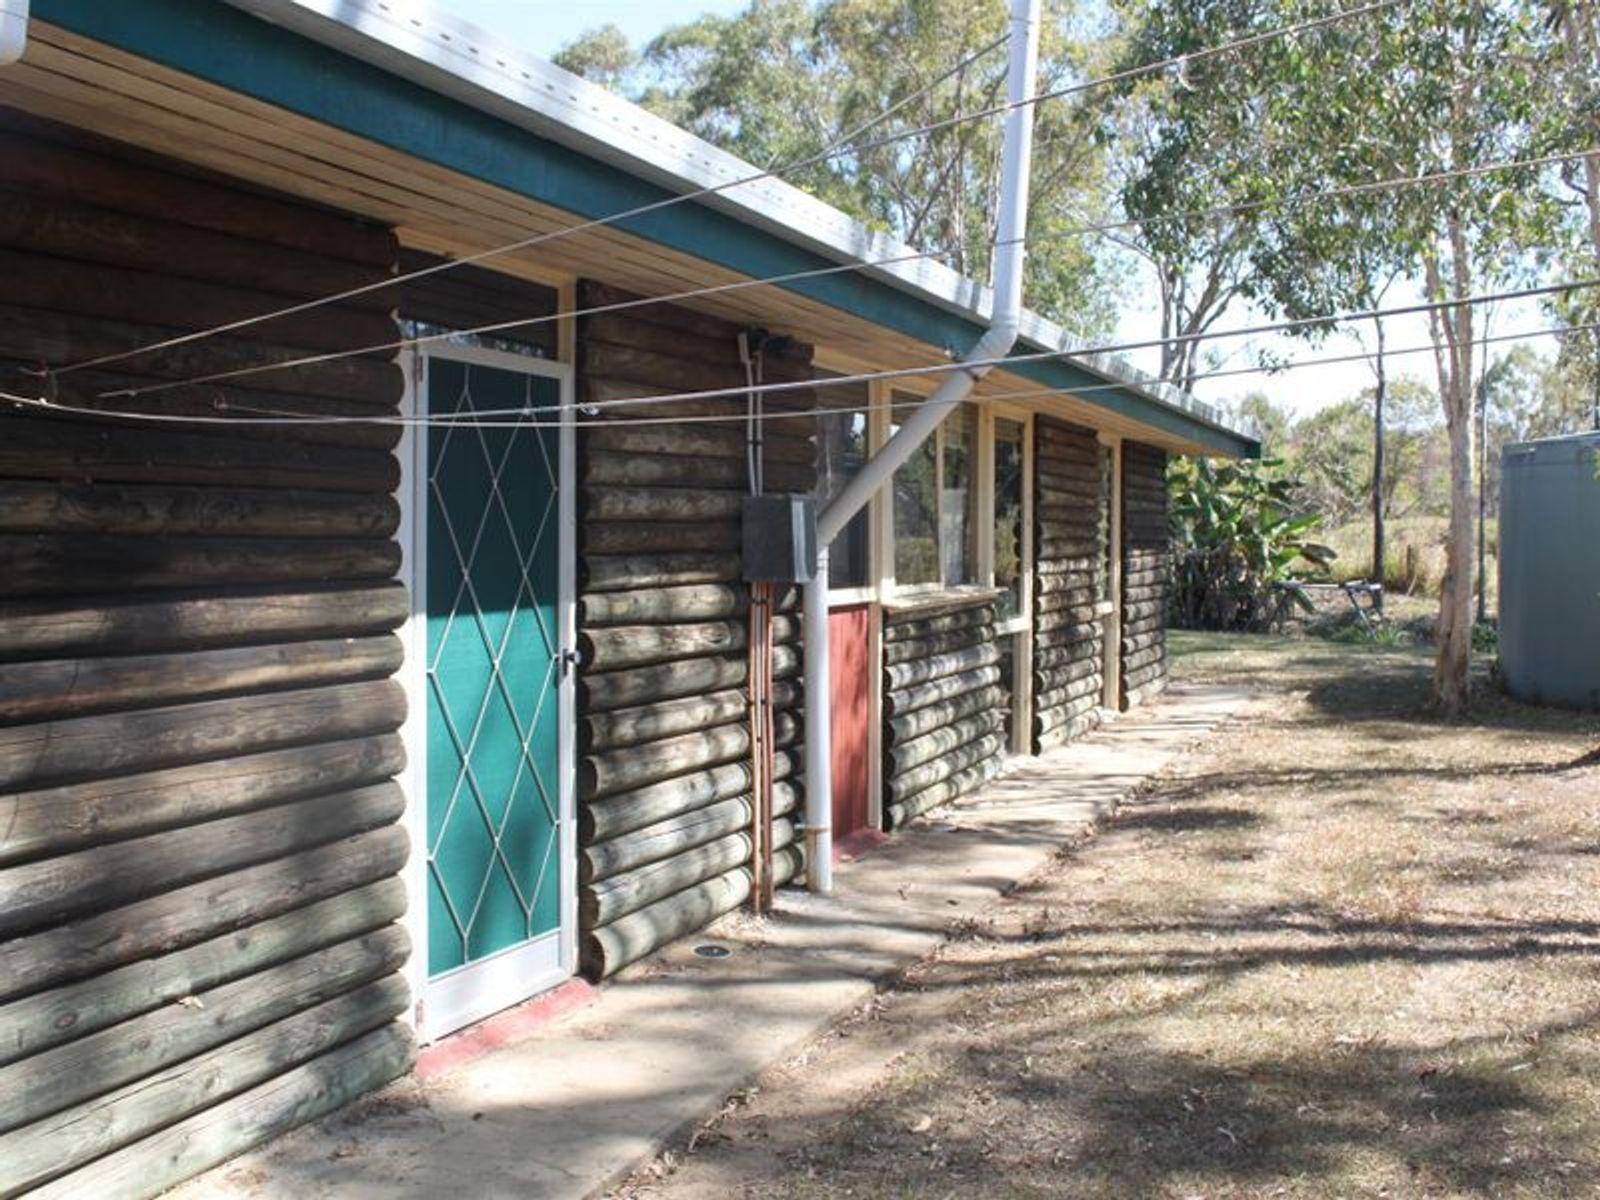 4/103 Miran Khan Drive, Freshwater Point, QLD 4737